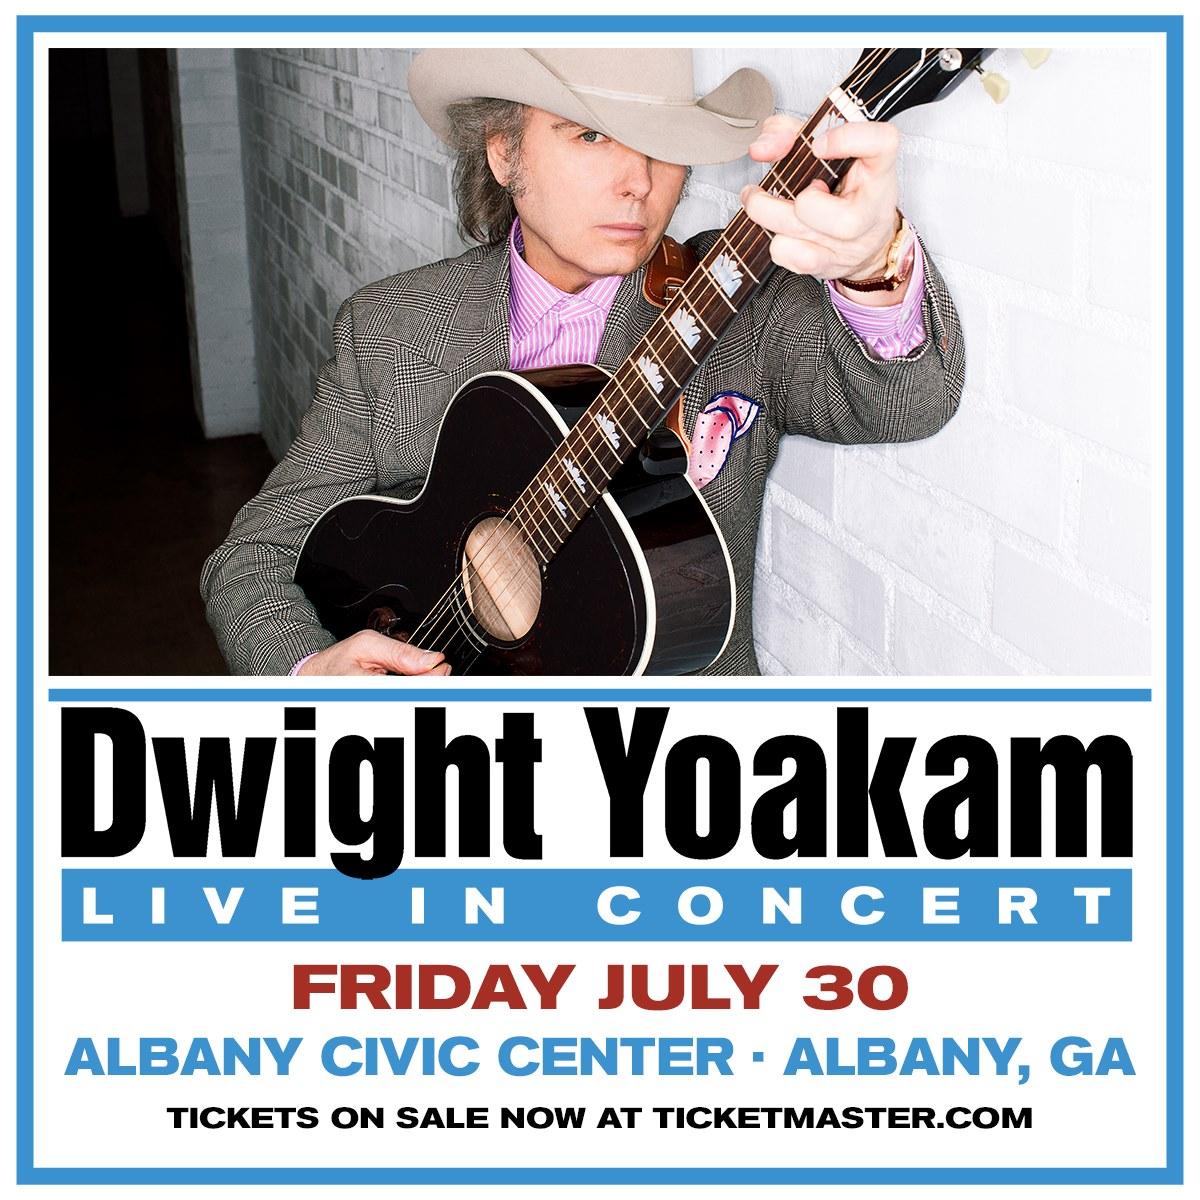 Dwight Yoakam Concert